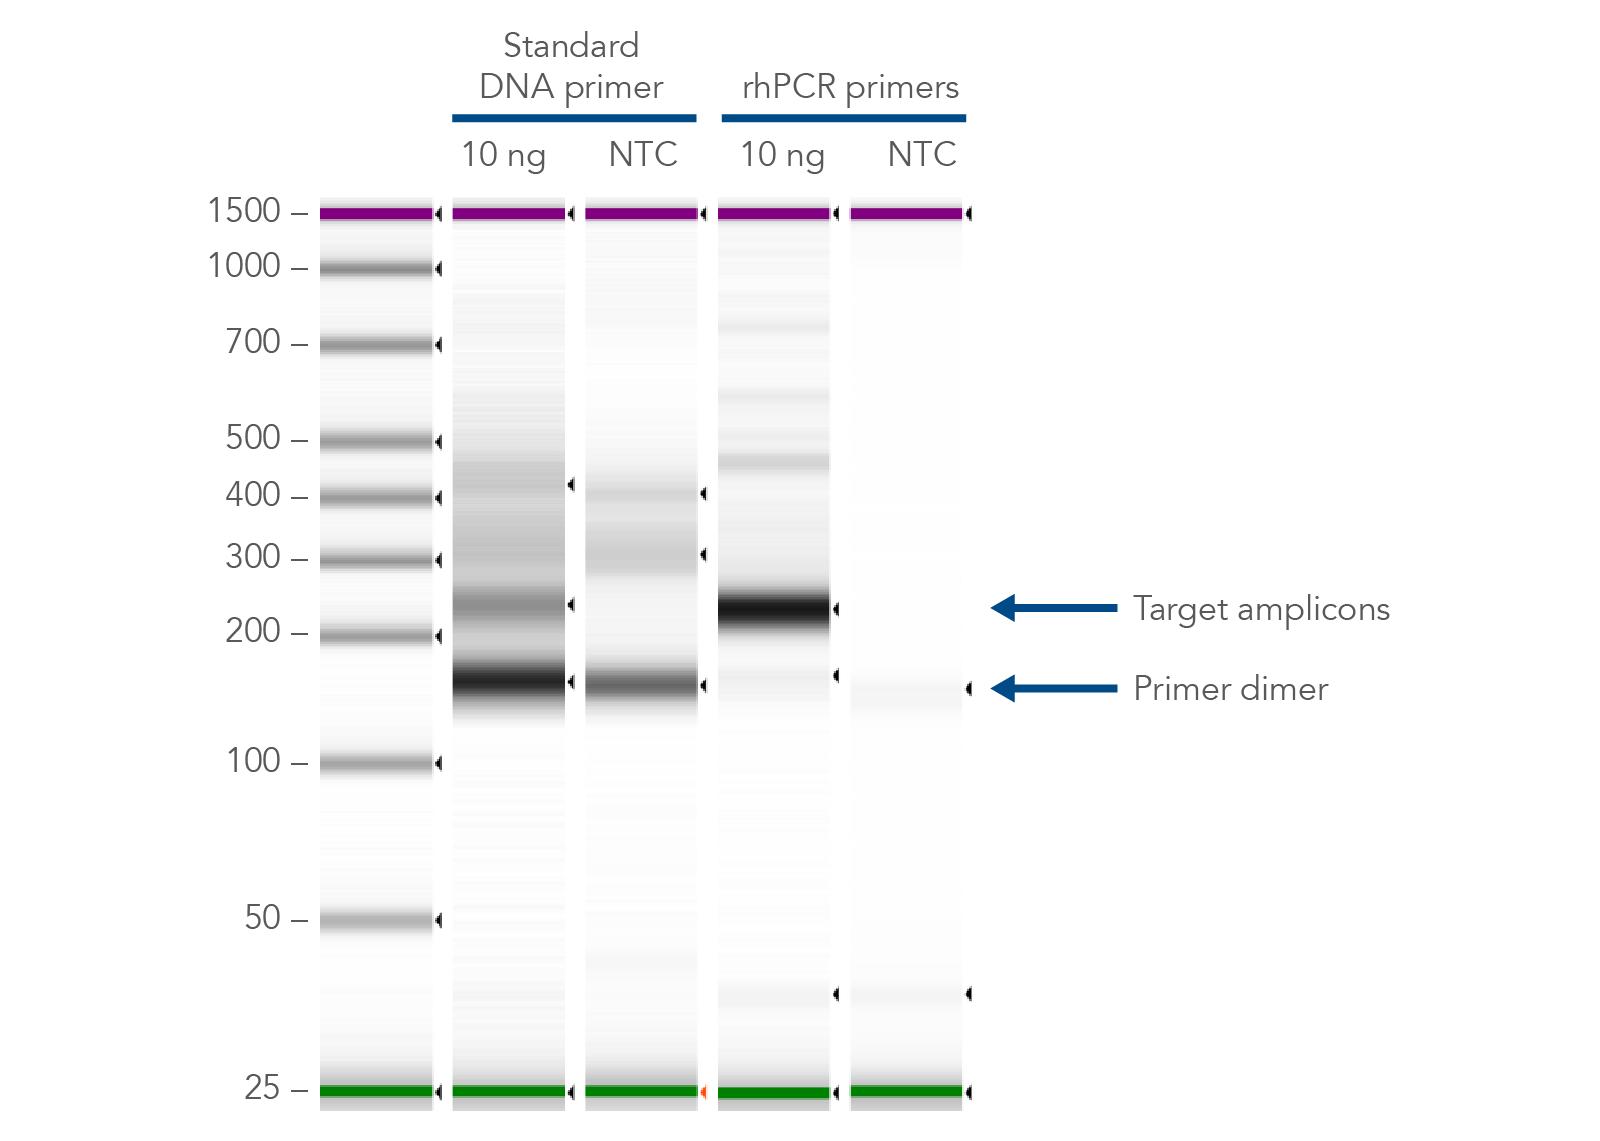 Gel image: minimize primer dimers with rhAmp PCR